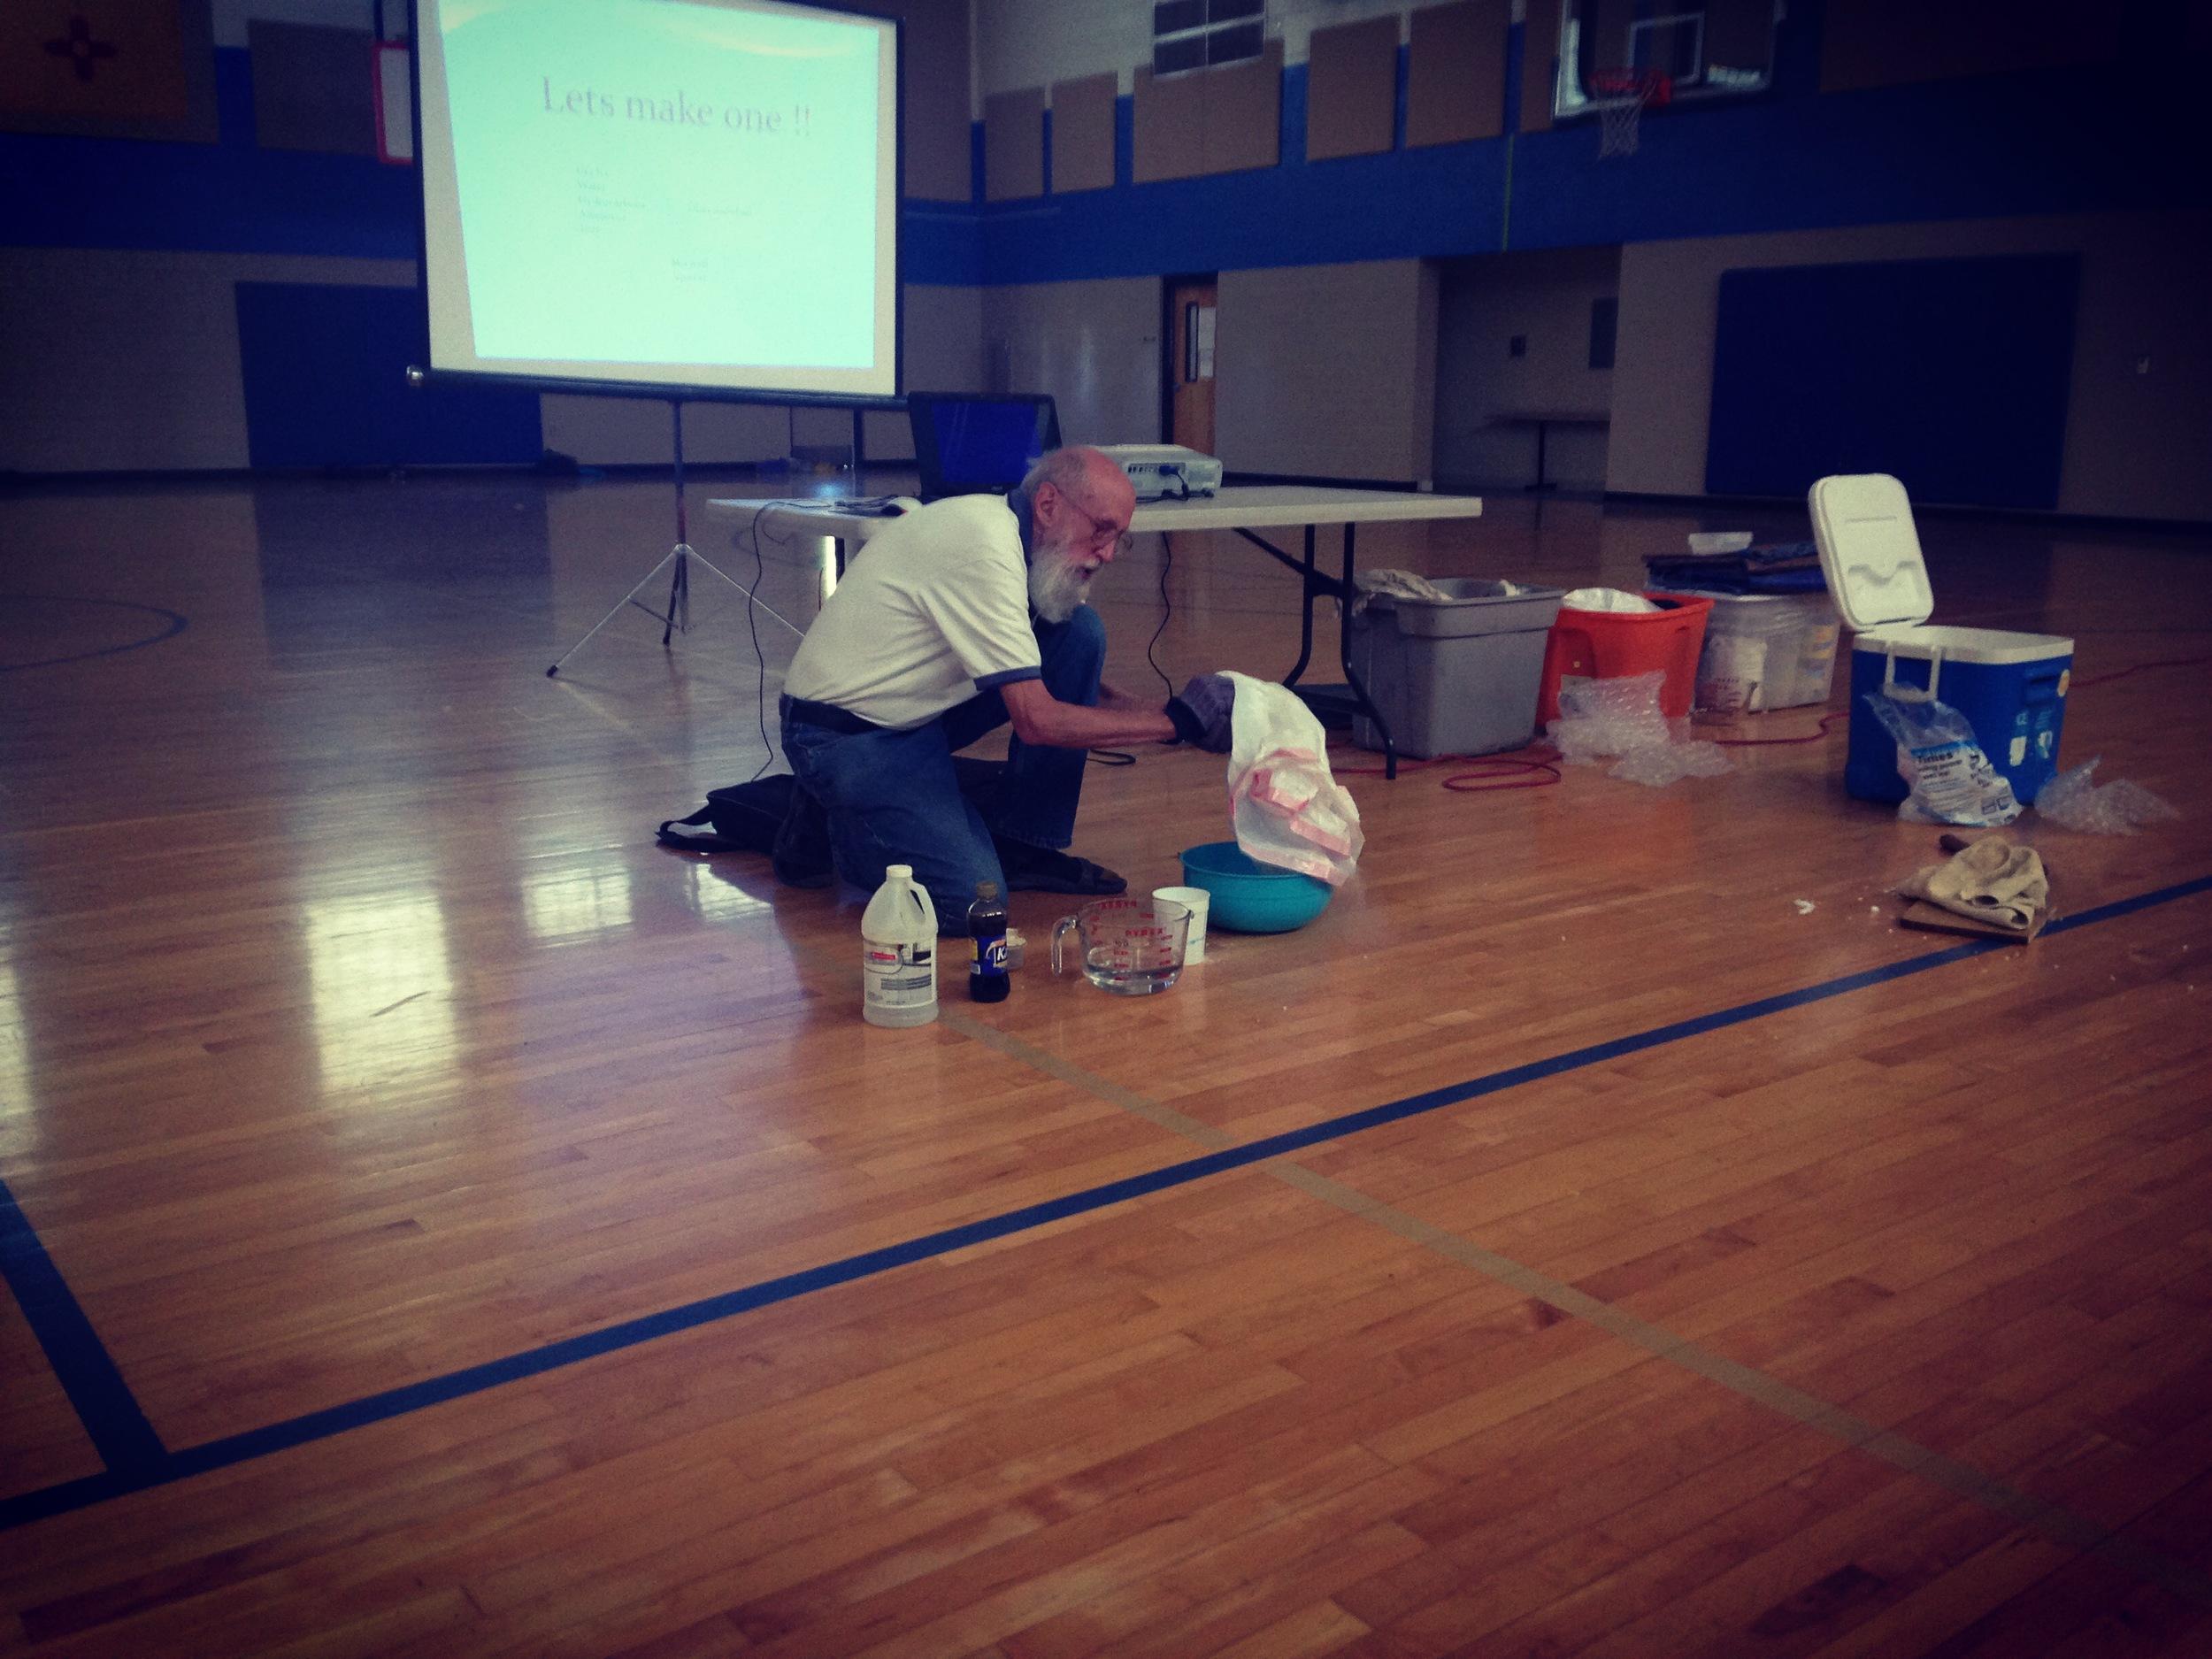 Dr. Dan Klinglesmith makes a commet during assembly